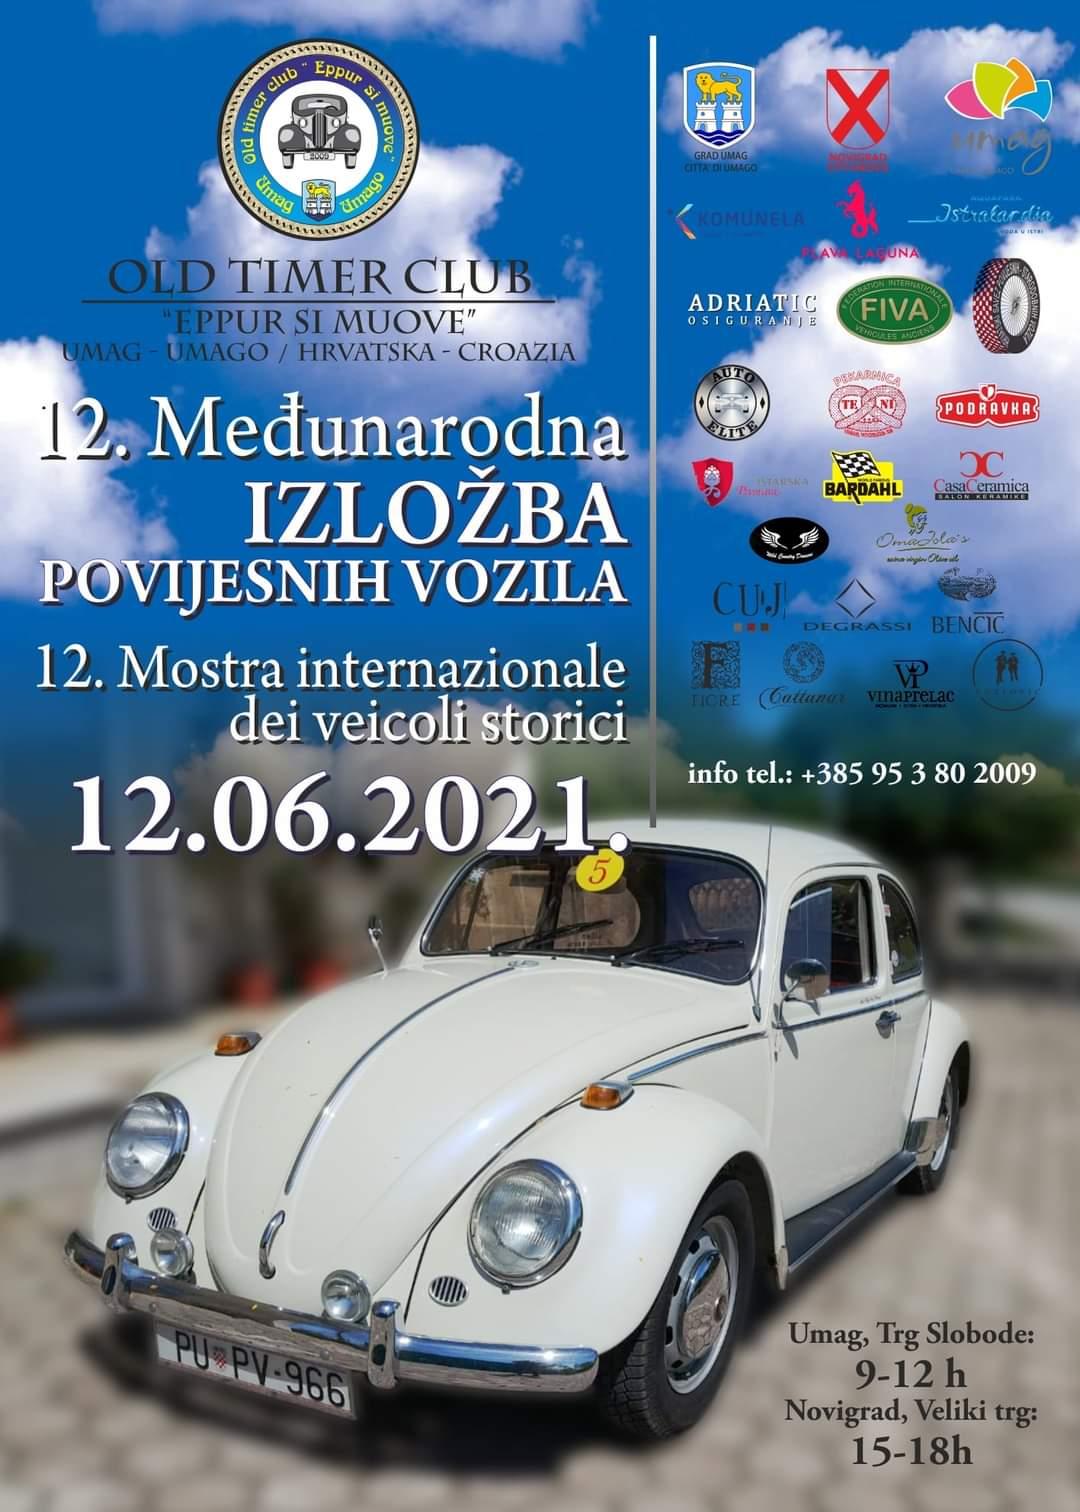 https://novigrad.hr/12._meunarodna_izlozhba_old_timer_vozila